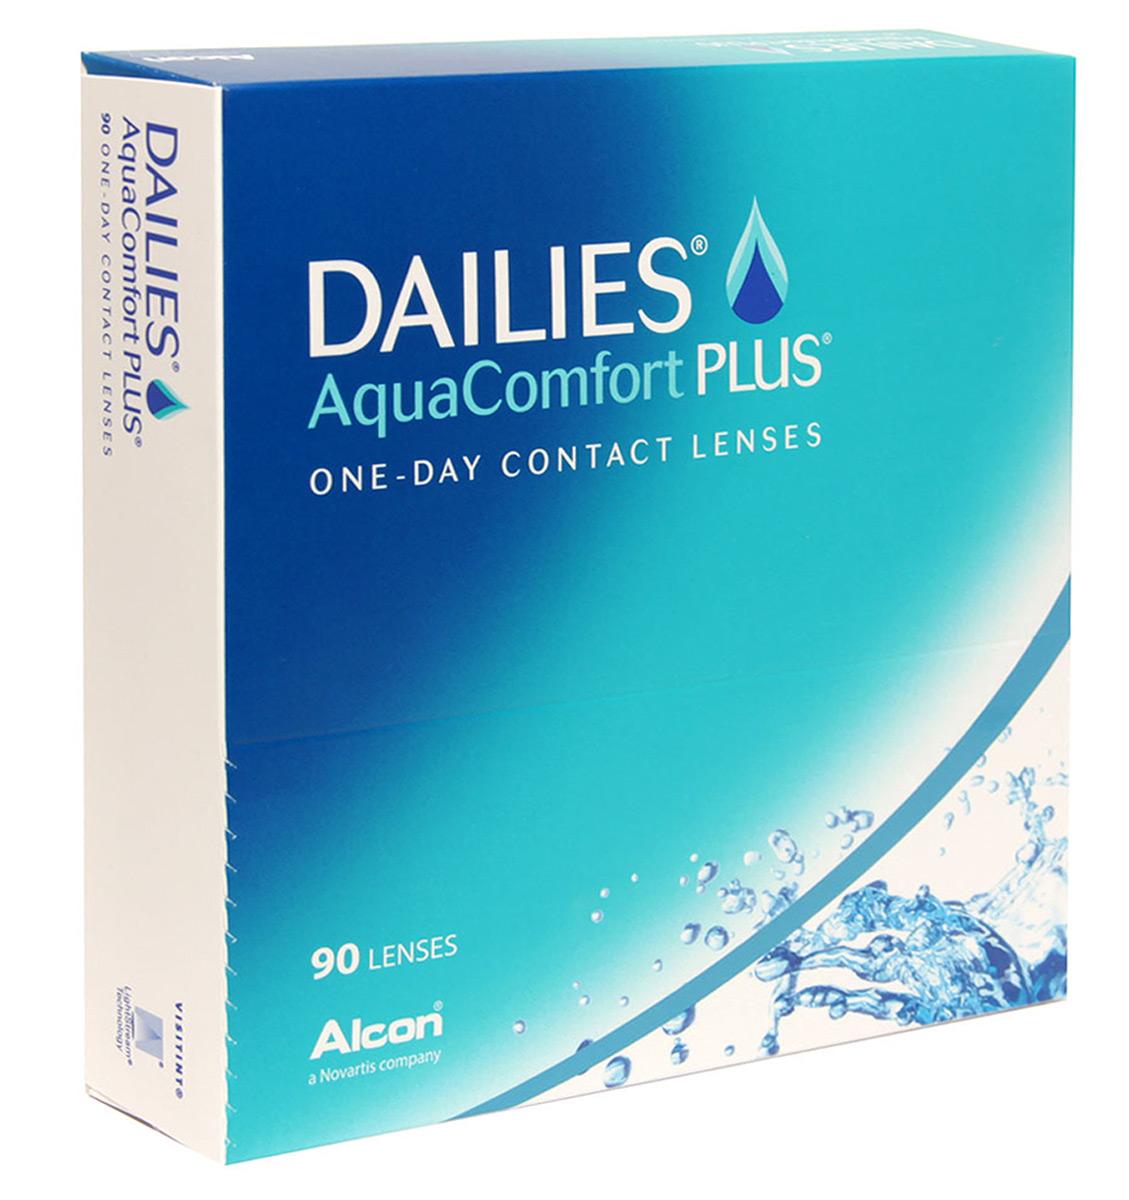 Alcon-CIBA Vision контактные линзы Dailies AquaComfort Plus (90шт / 8.7 / 14.0 / +3.75)